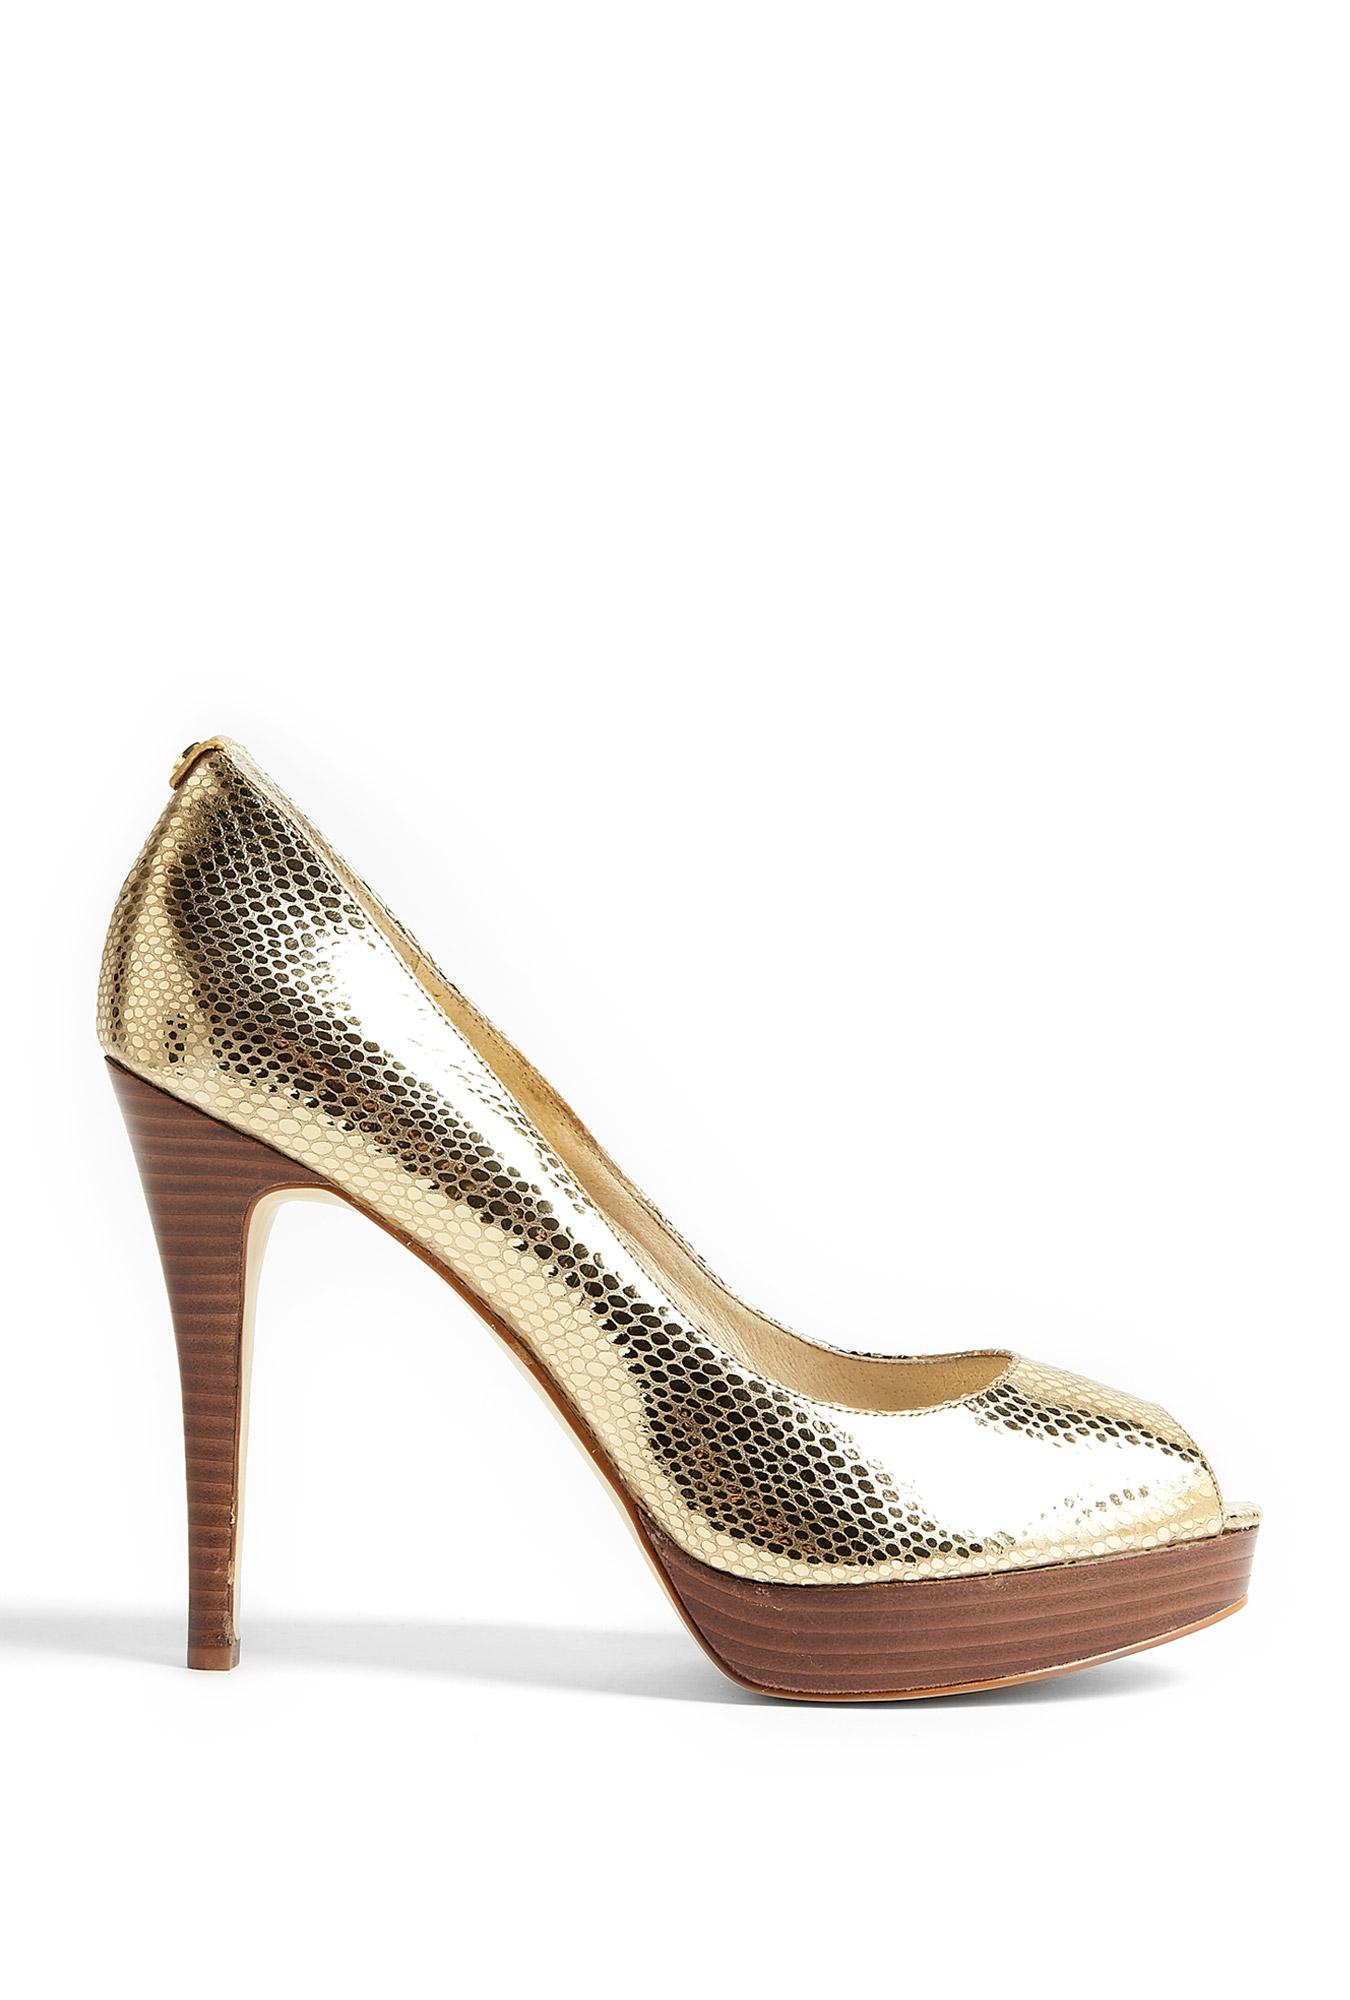 michael michael kors pale gold york platform peeptoe court shoes in gold lyst. Black Bedroom Furniture Sets. Home Design Ideas